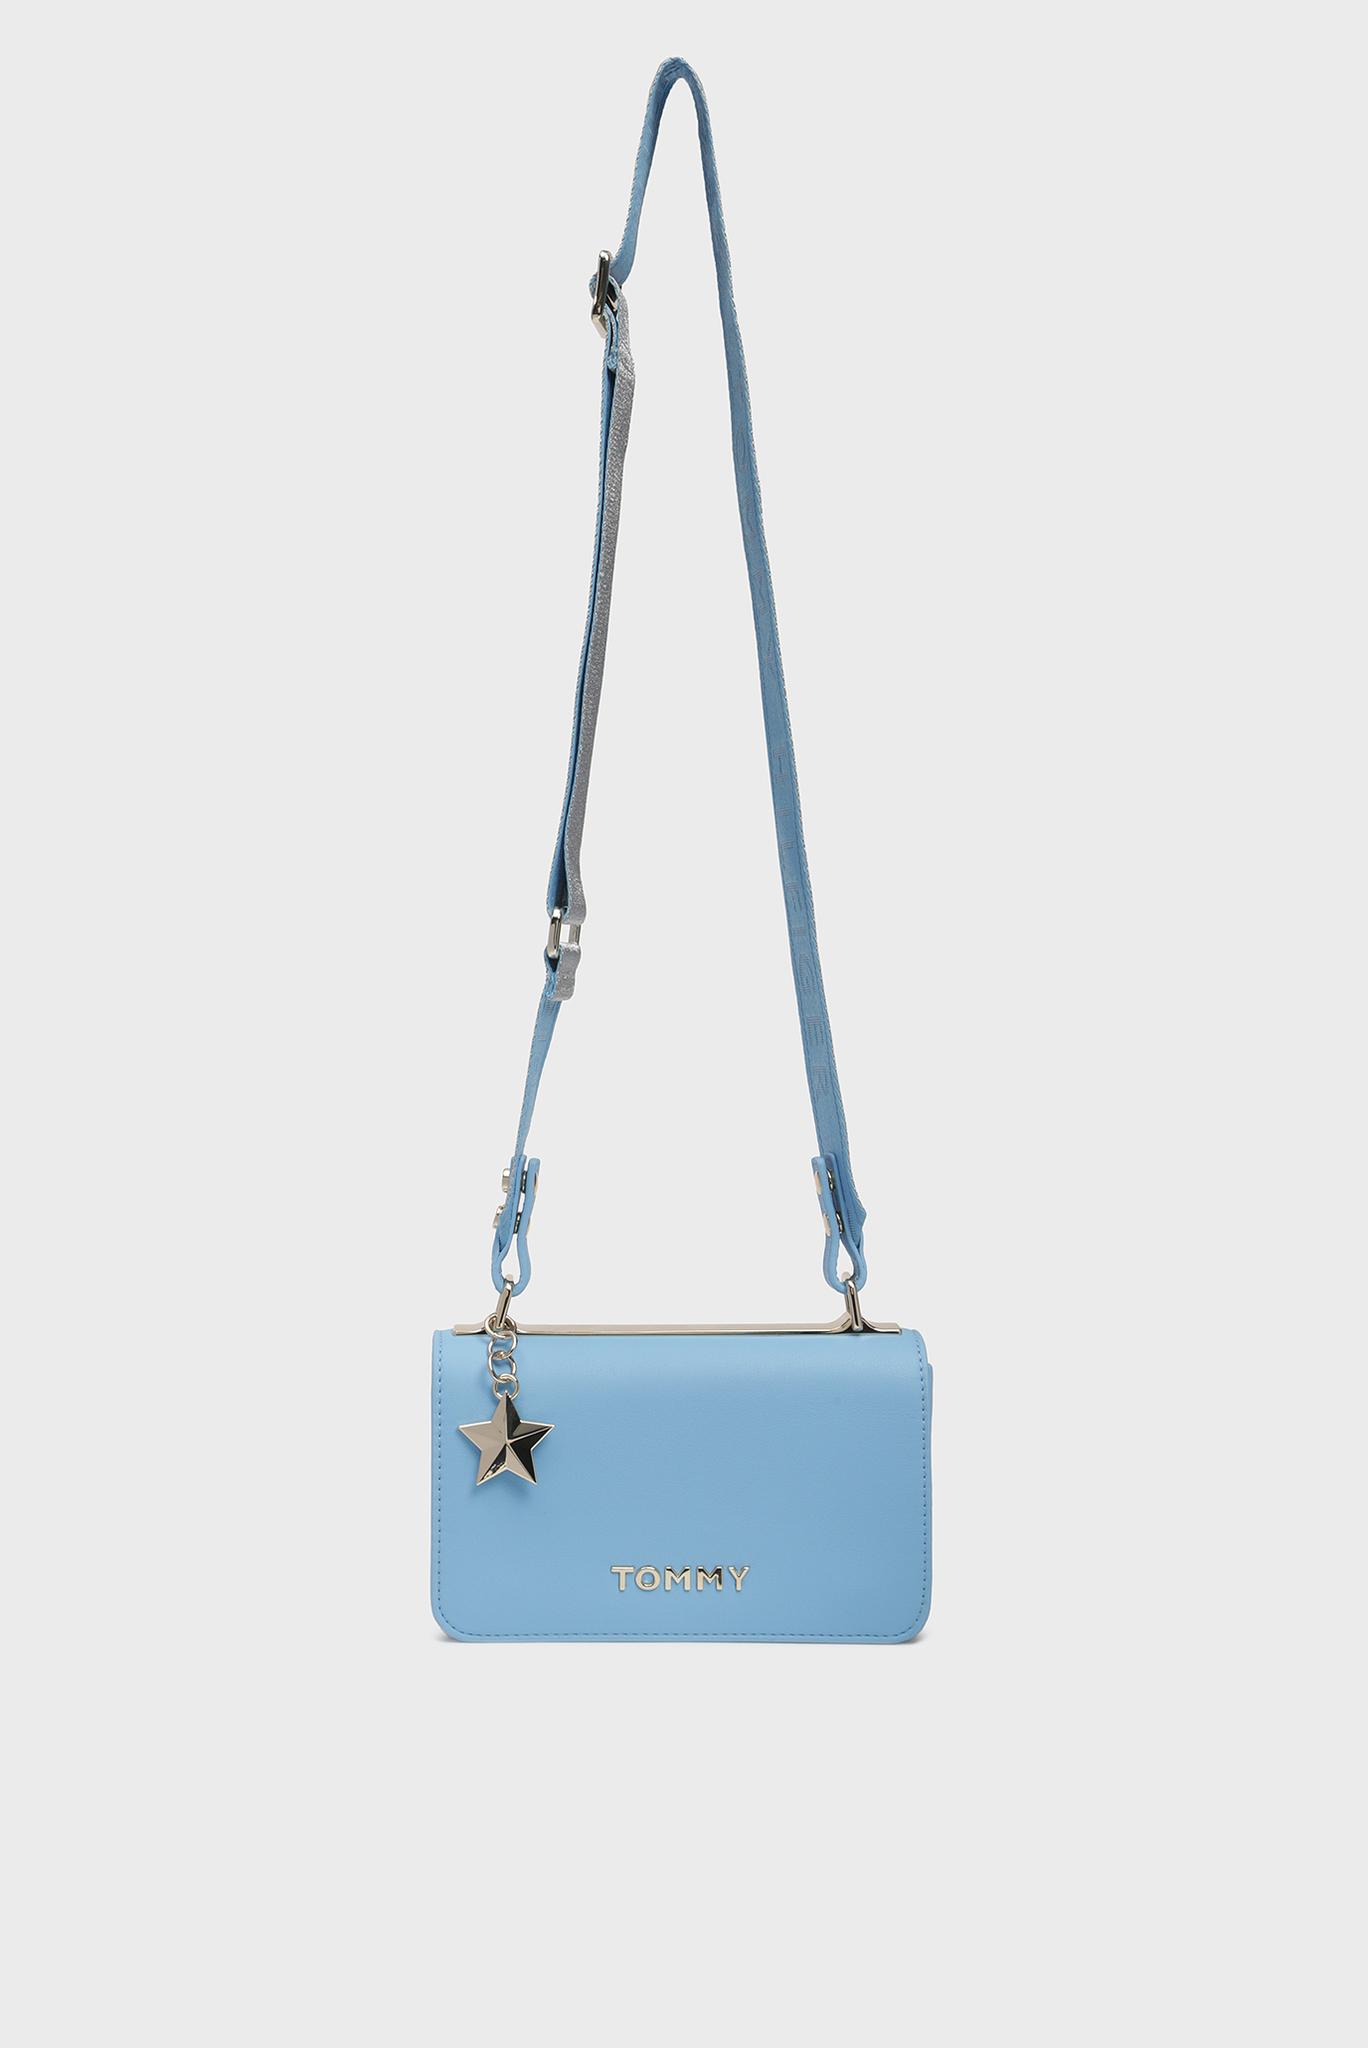 Женская голубая сумка через плечо TOMMY STATEMENT CROSSOVER Tommy Hilfiger